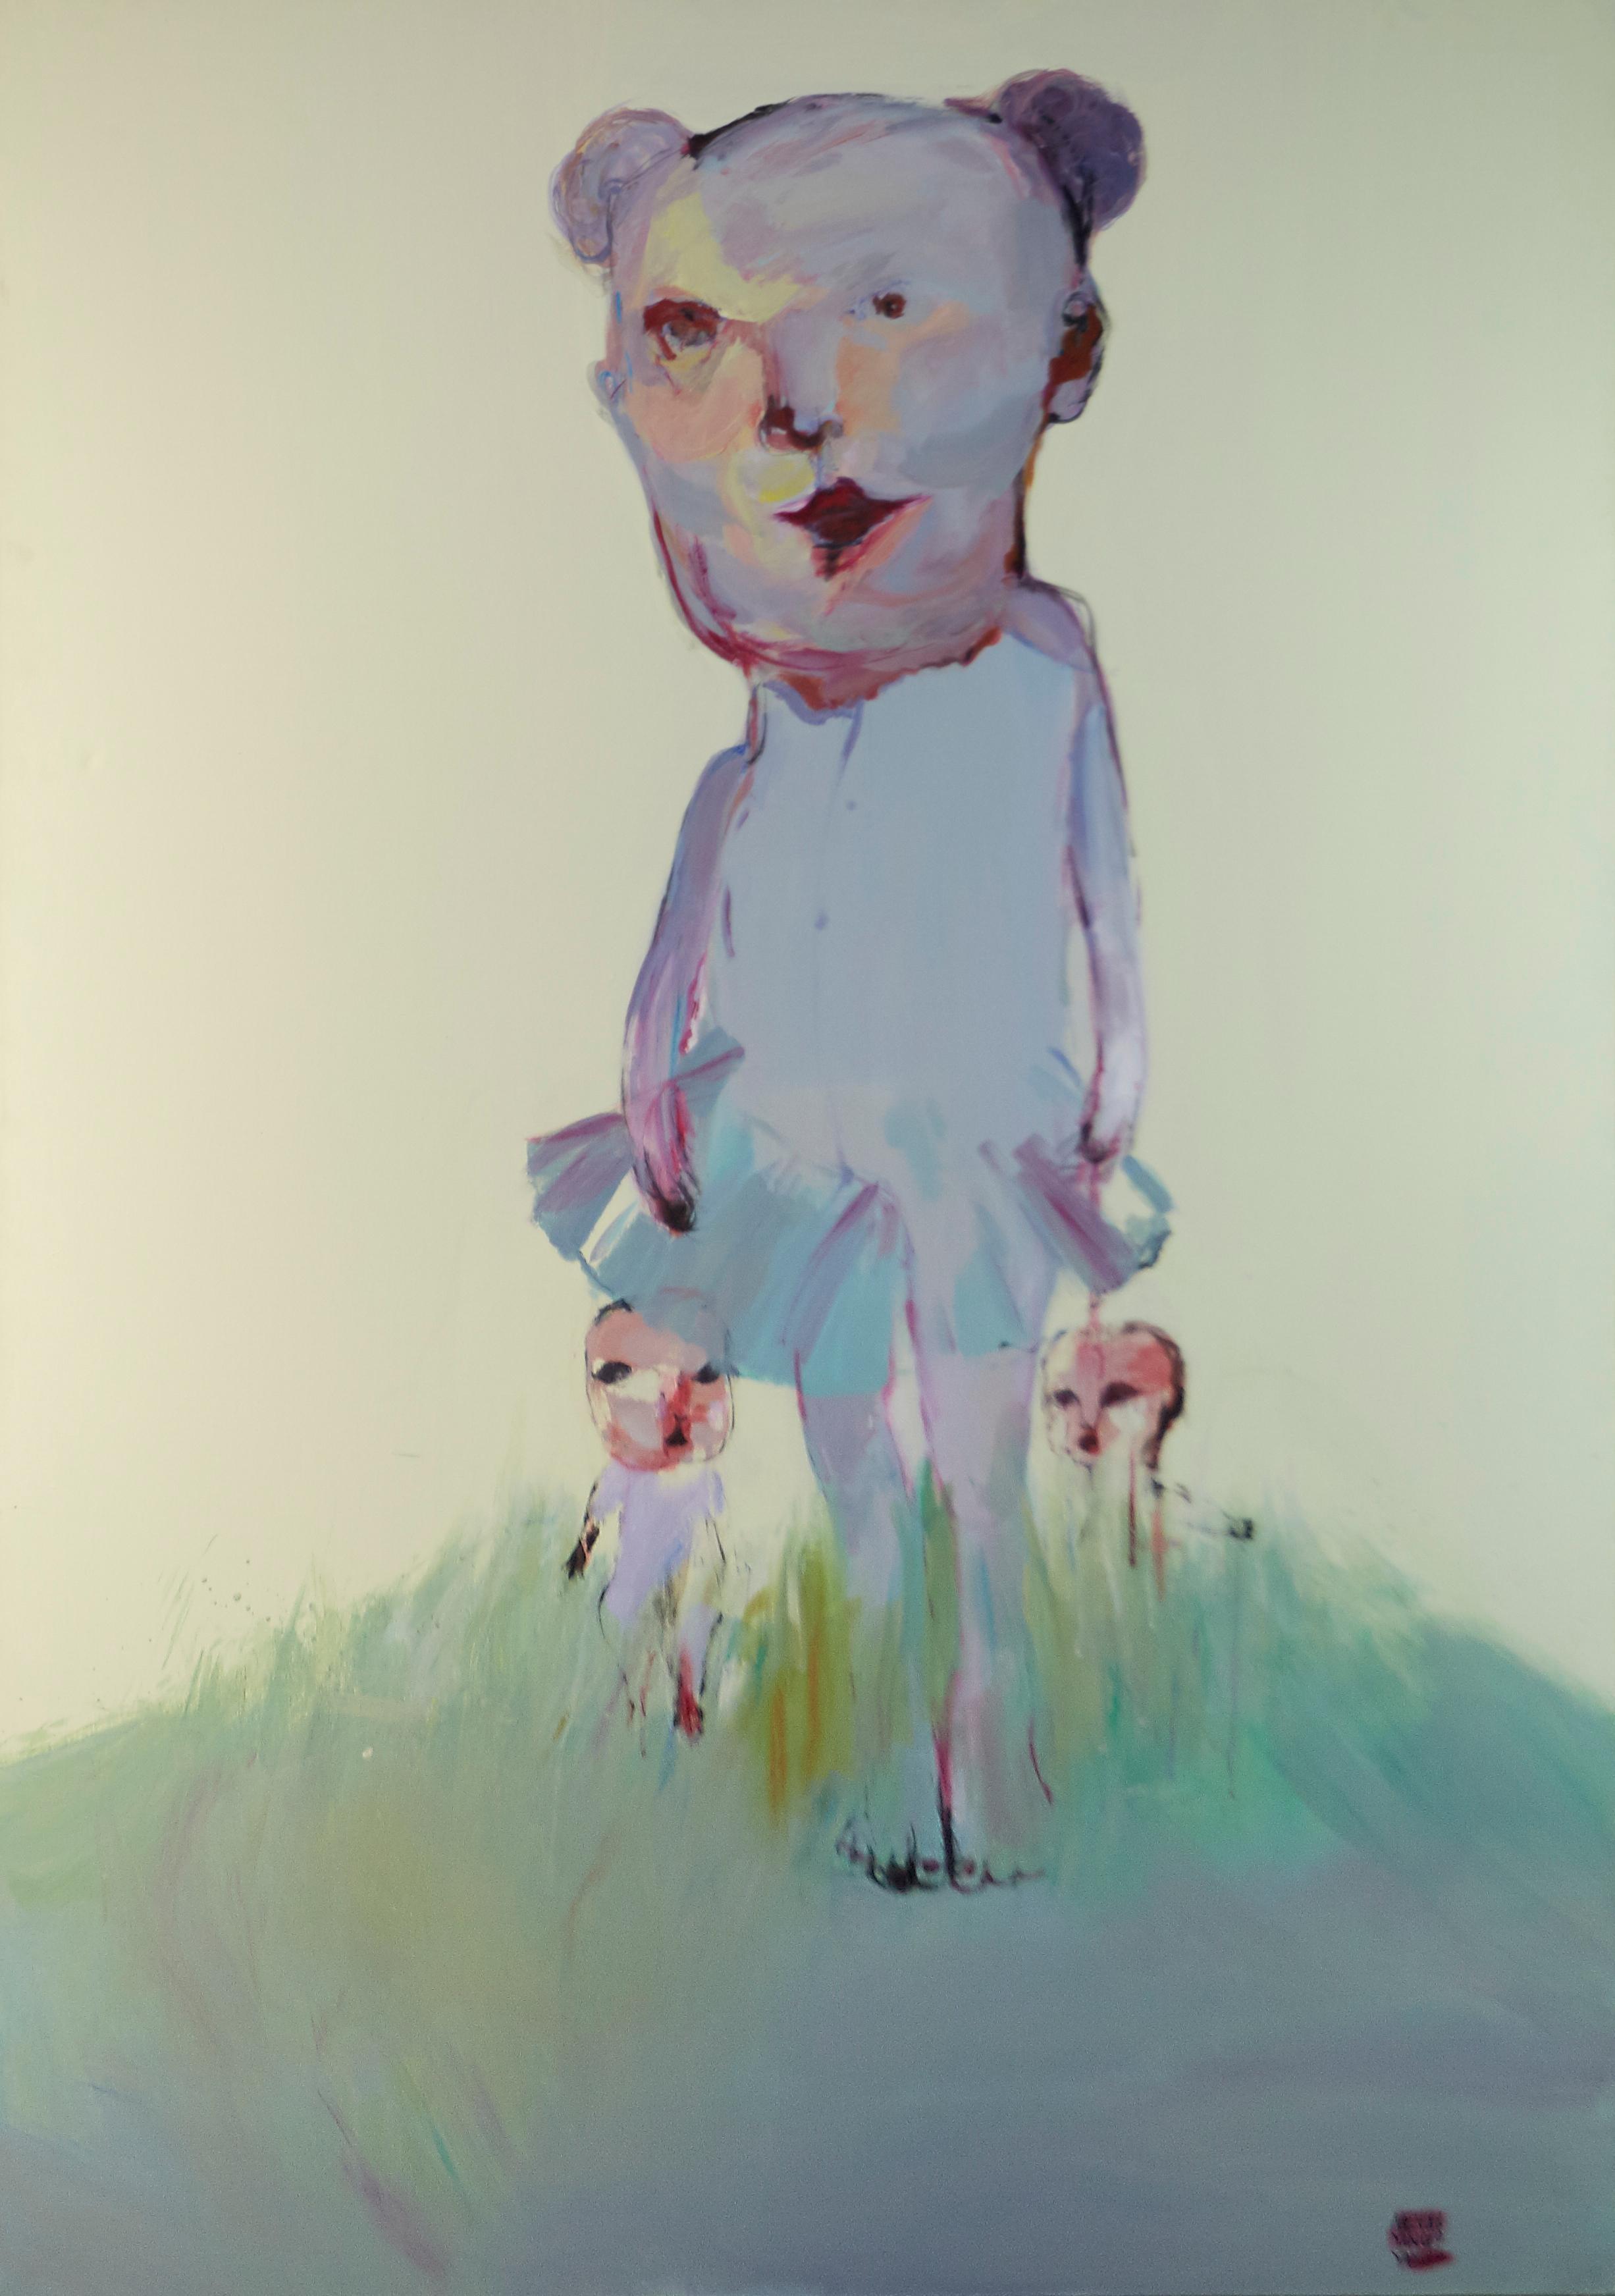 Meng Yang Yang - Untitled (morph and two kids) Tianti, 2006